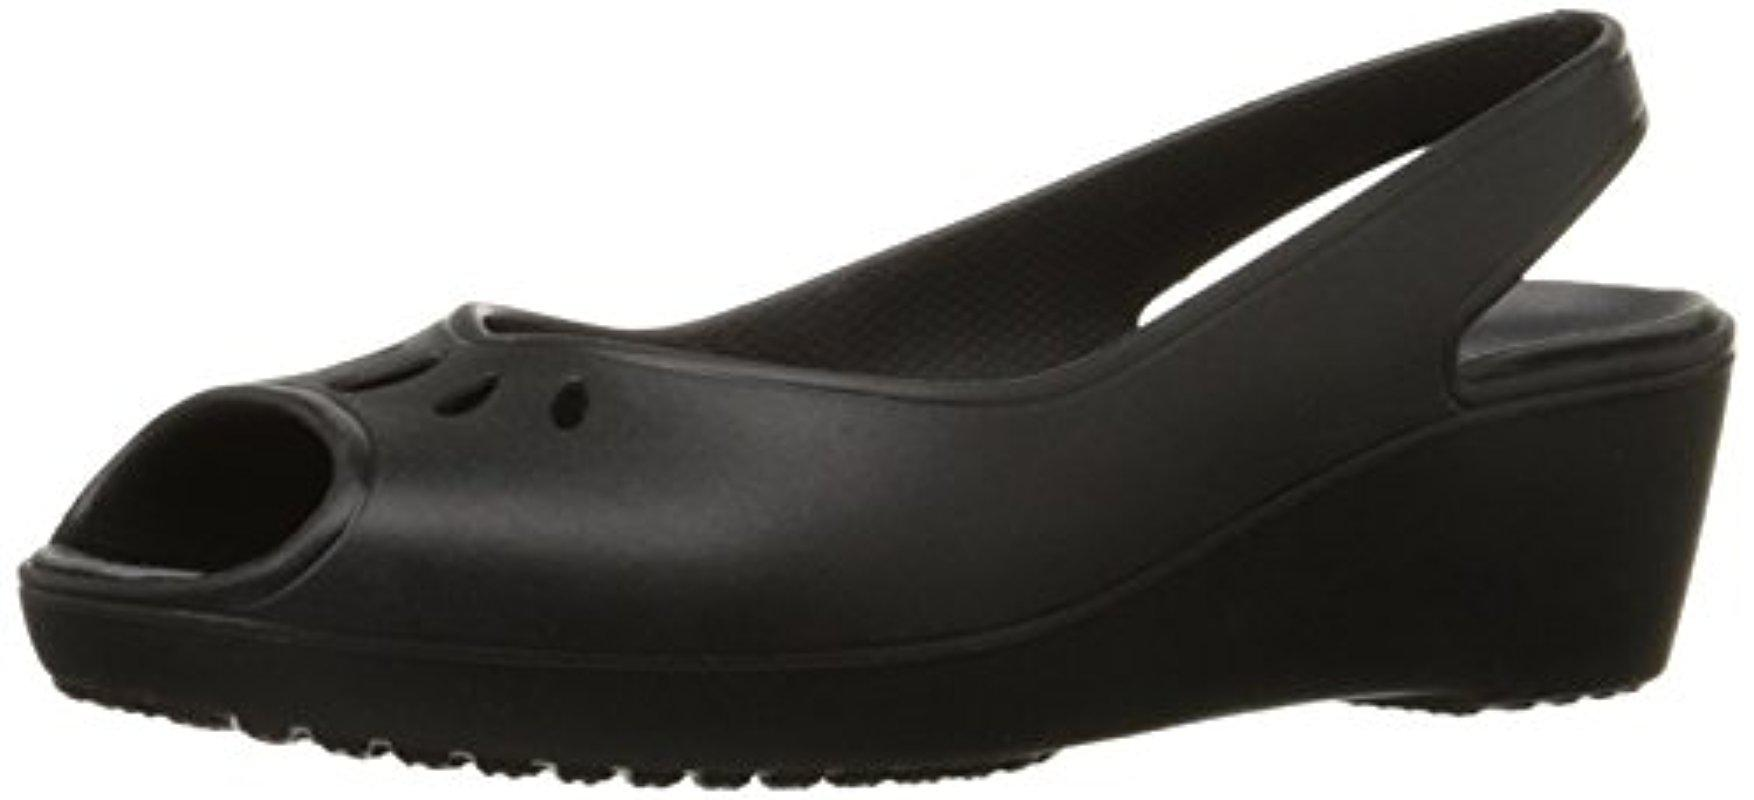 a4bba9025d61a Lyst - Crocs™ Mabyn Slingback Mini Wedge in Black